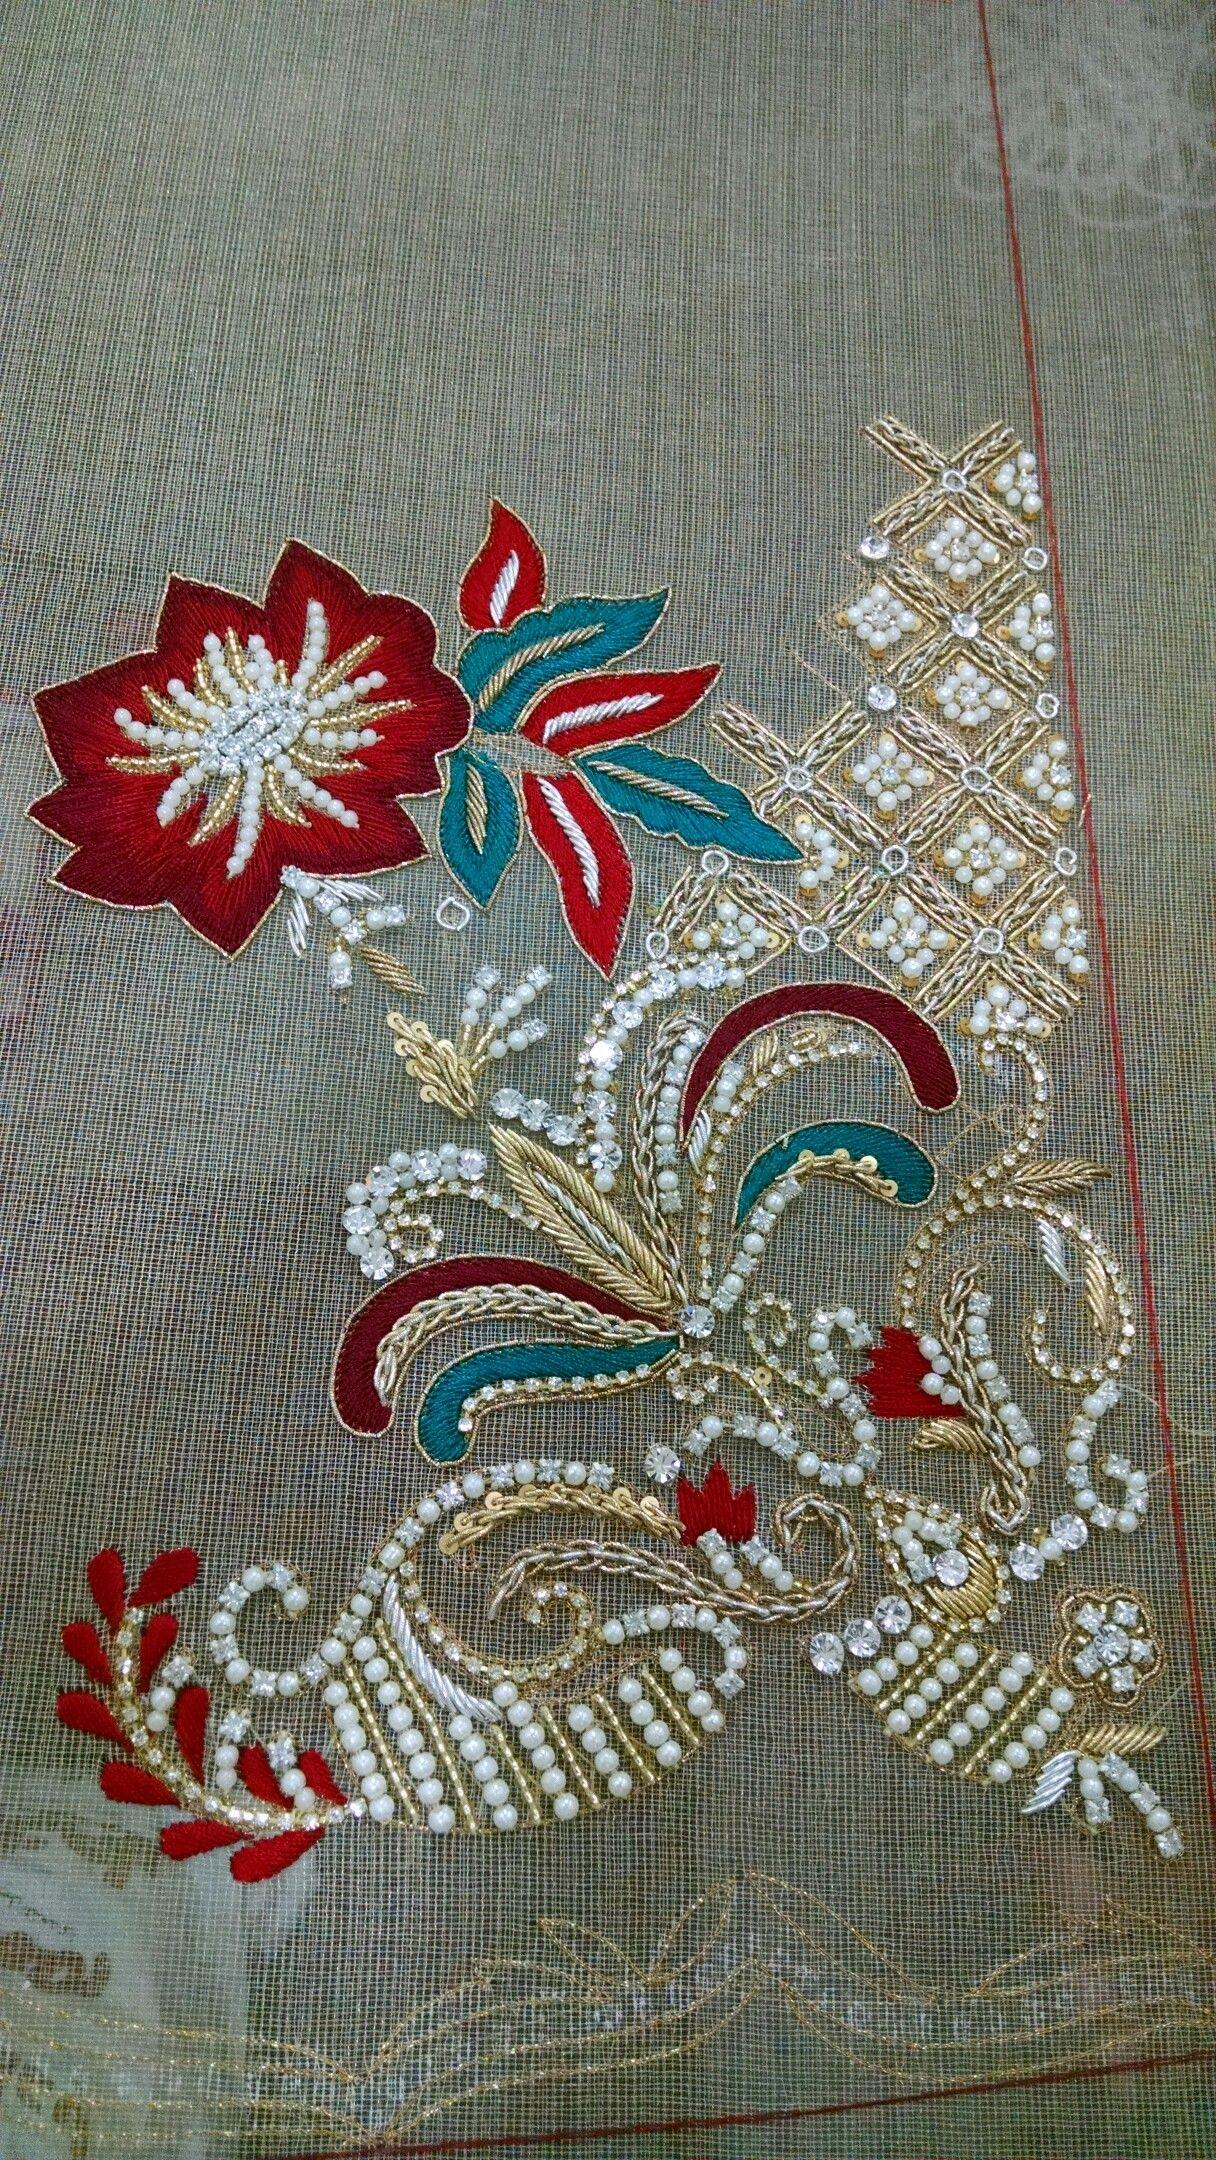 Pin de Lia Halim en Embroidery   Pinterest   Pedreria, Abalorios y ...